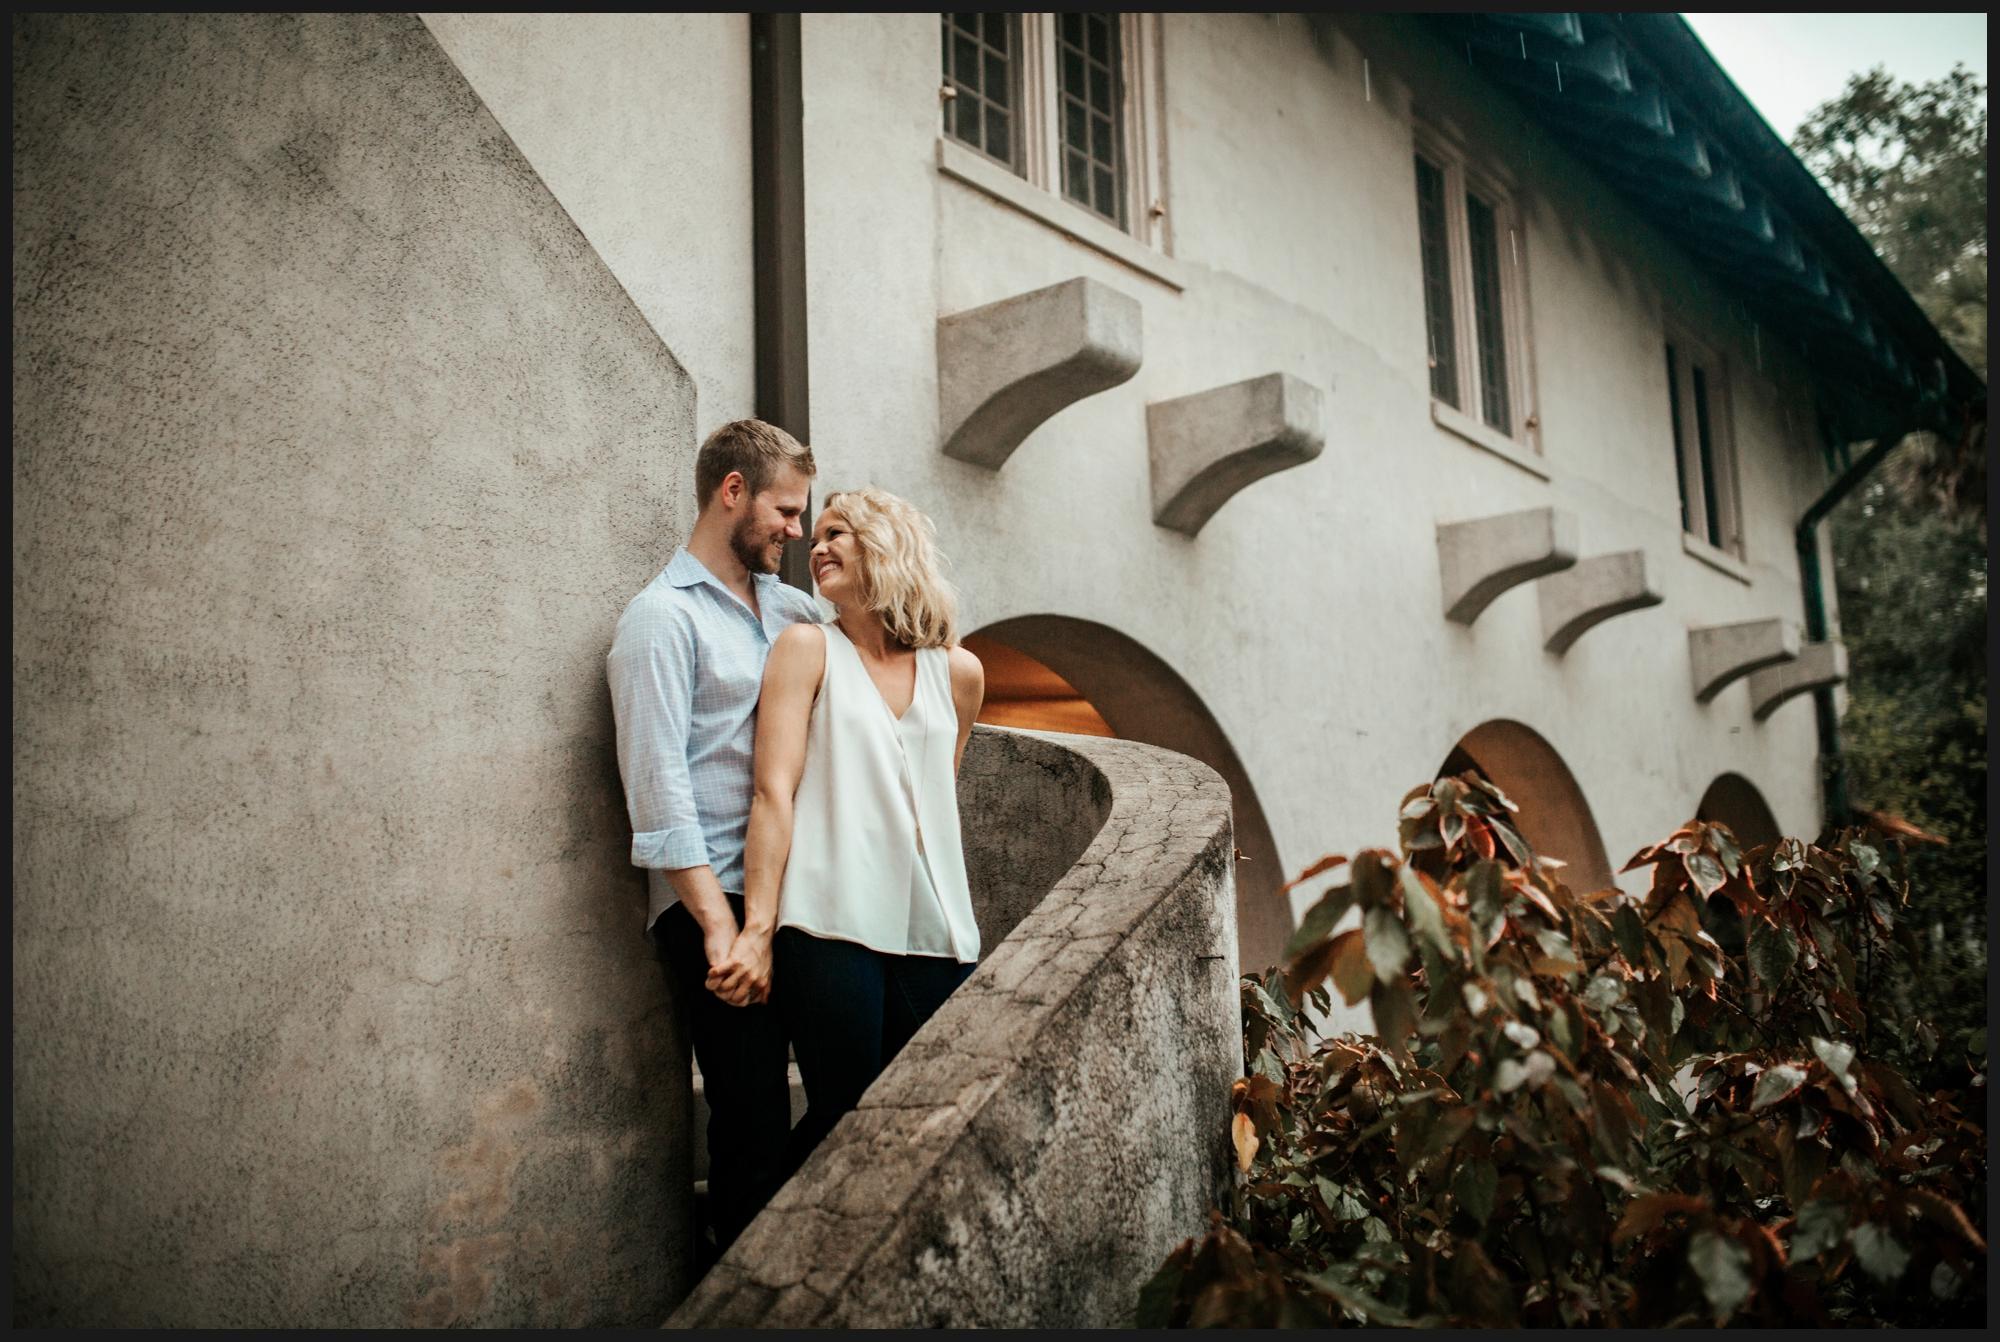 Orlando-Wedding-Photographer-destination-wedding-photographer-florida-wedding-photographer-bohemian-wedding-photographer_0211.jpg